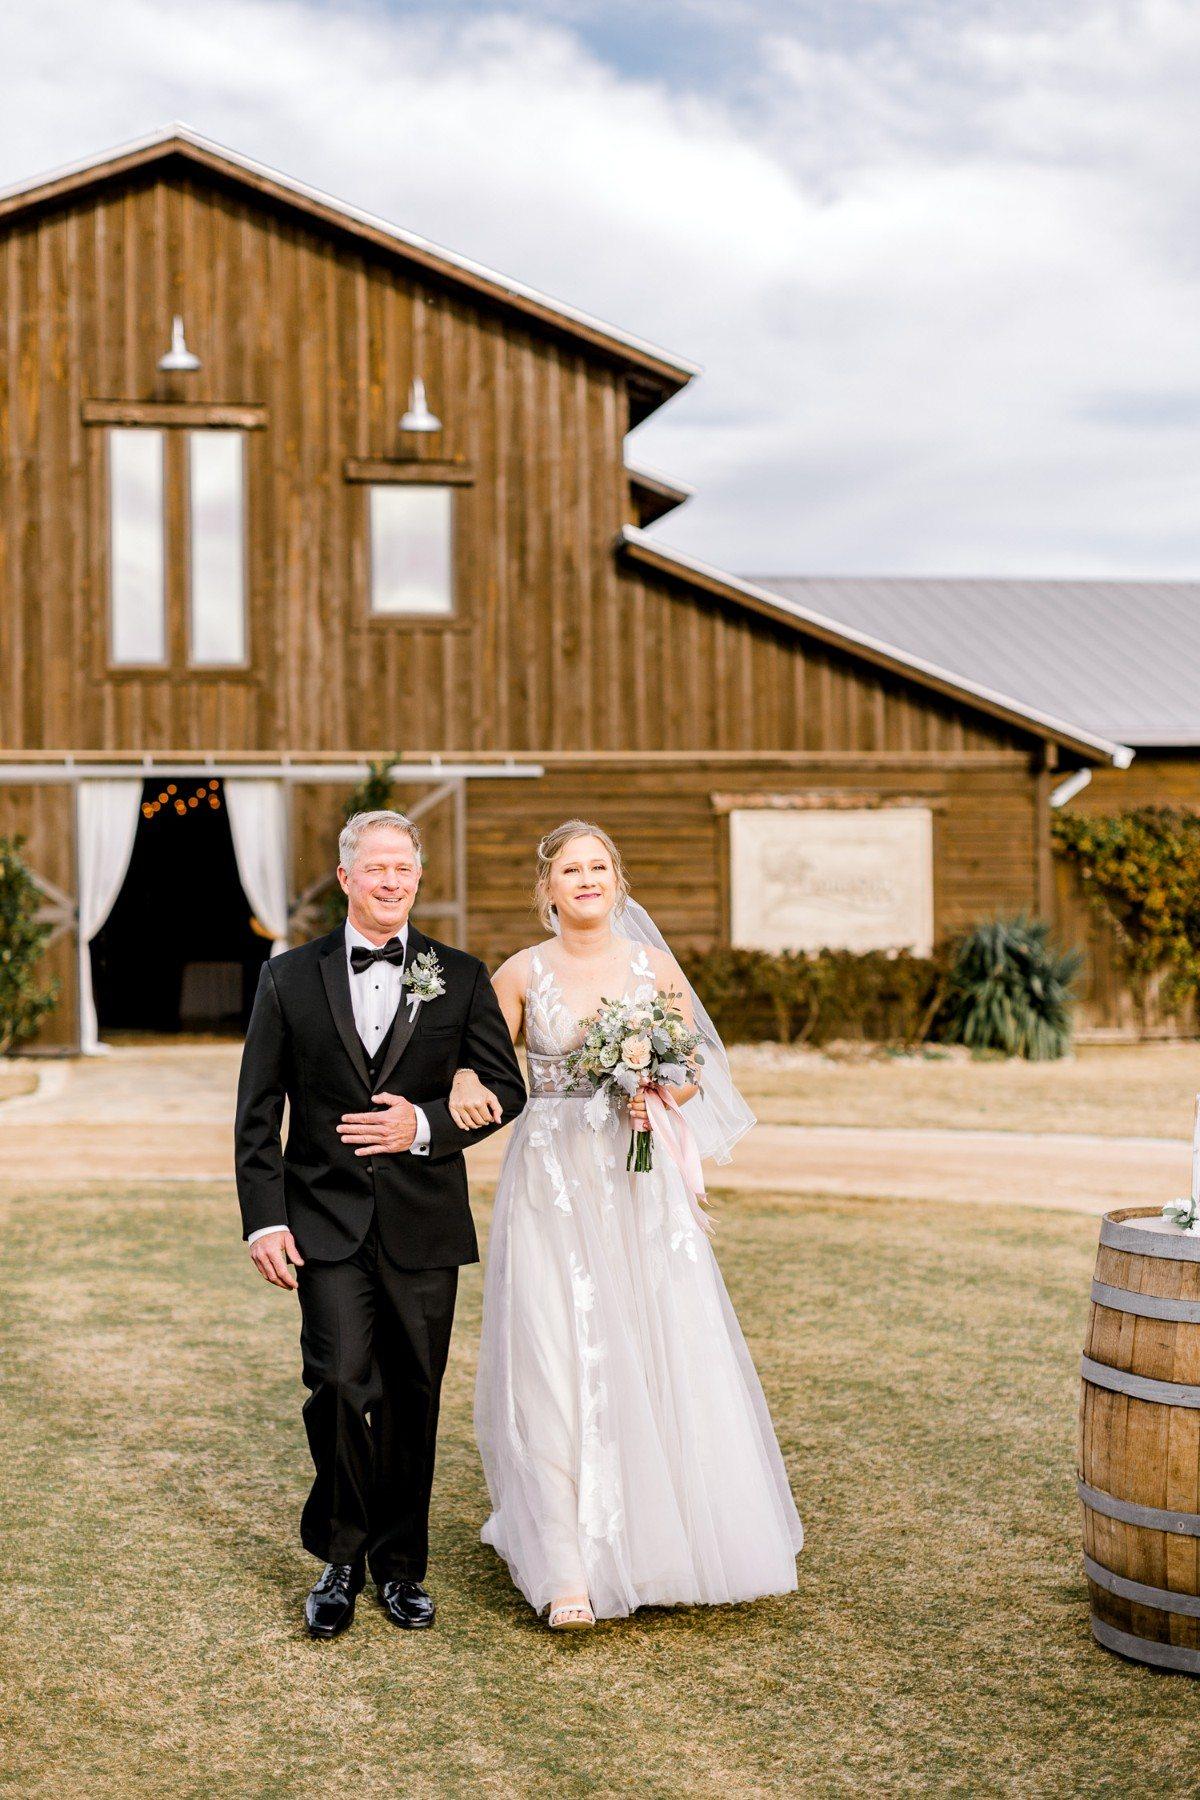 ennis-texas-wedding-photographer-kaitlyn-bullard-67.jpg